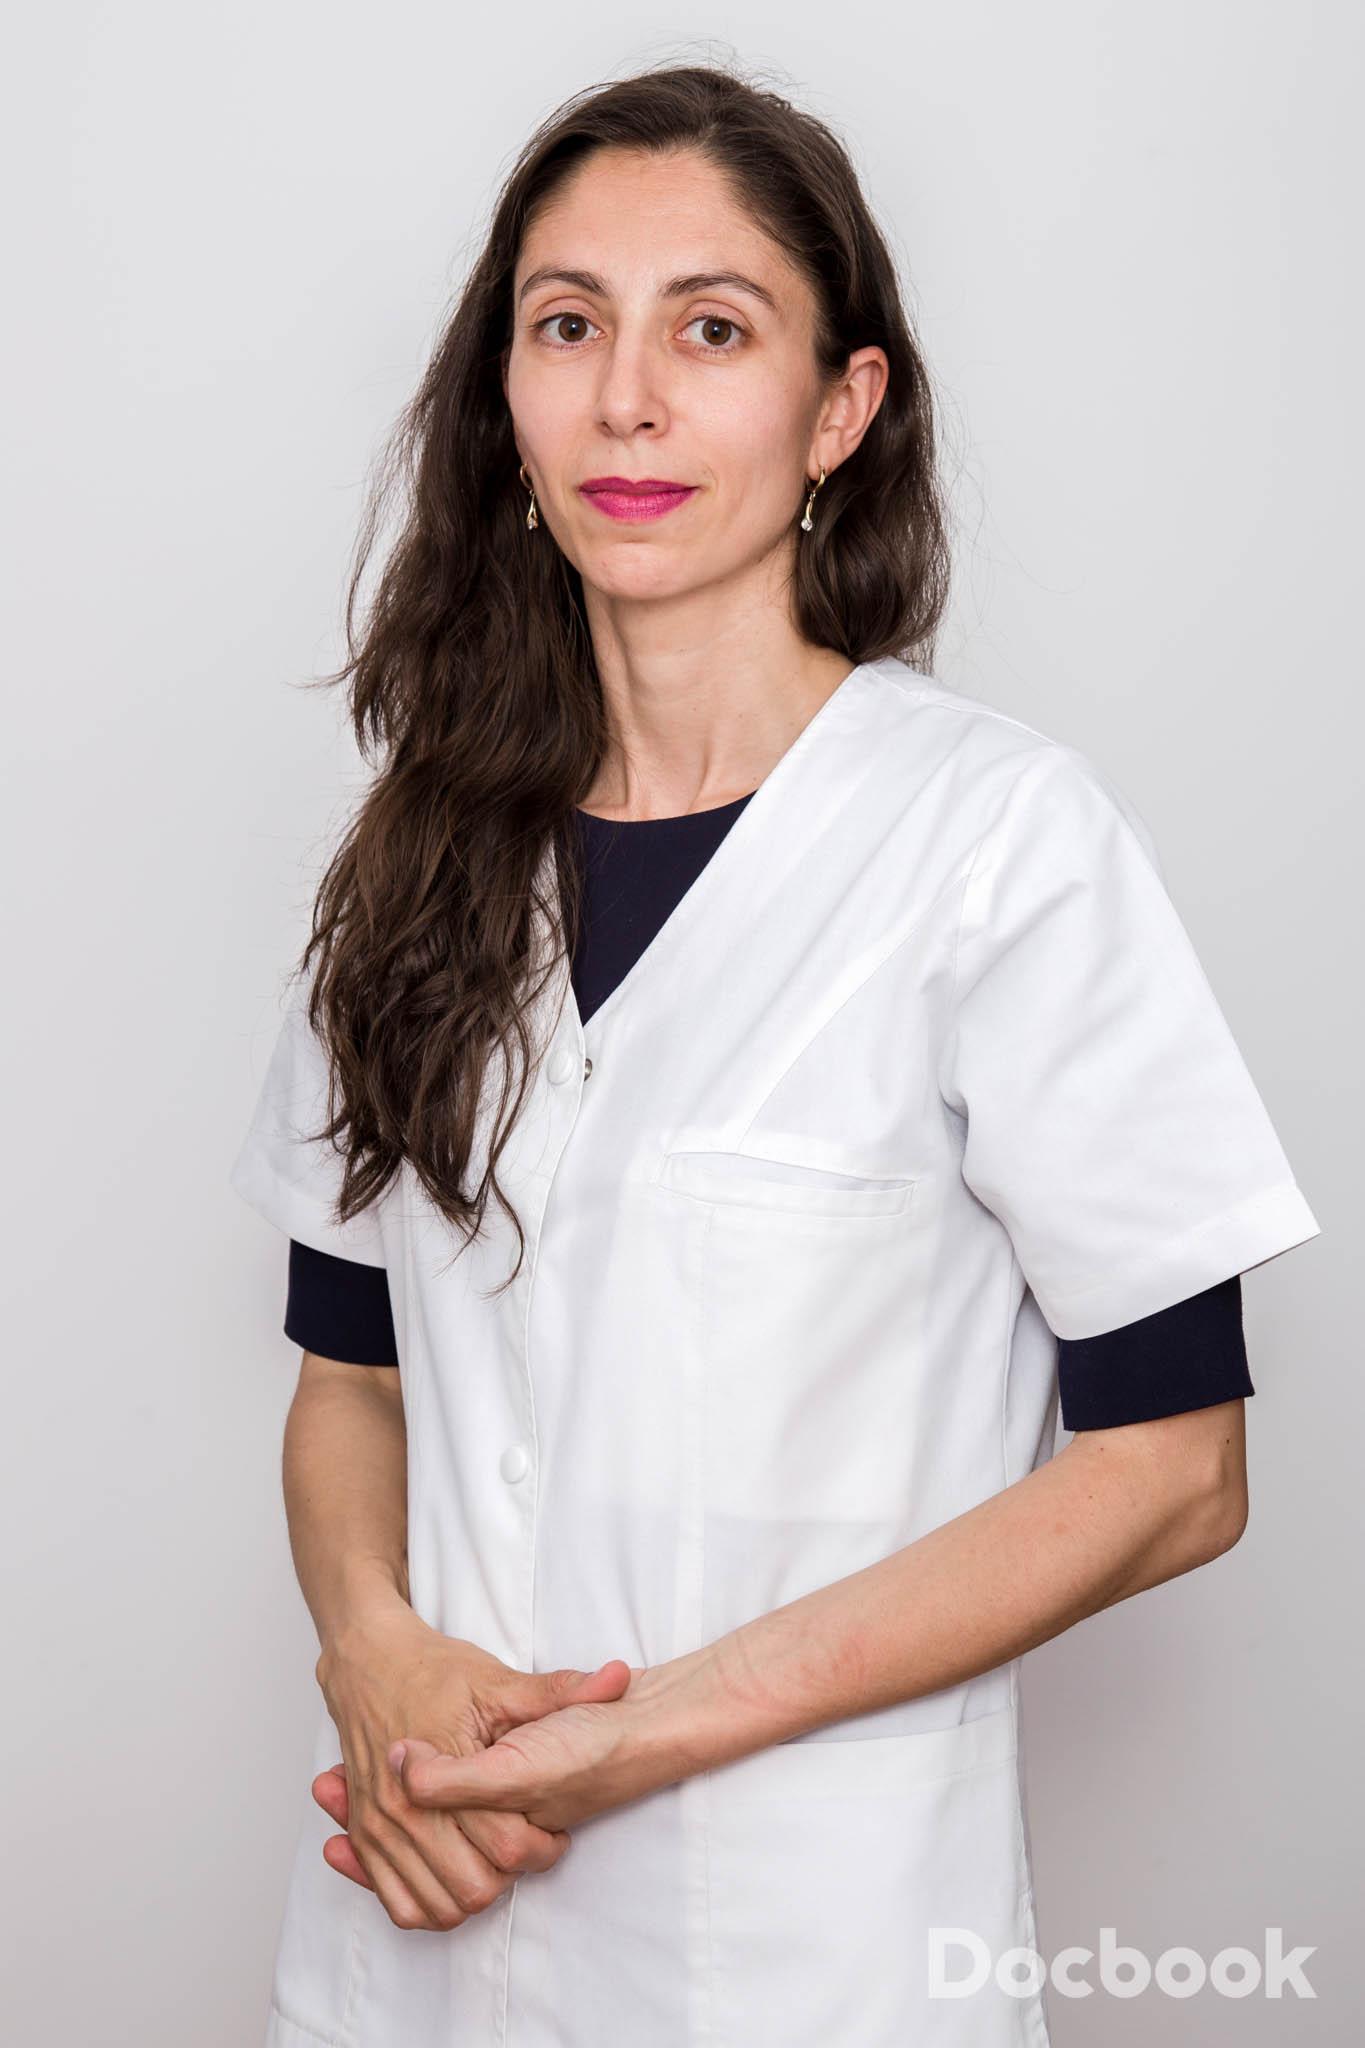 Dr. Camelia Cimpoesu